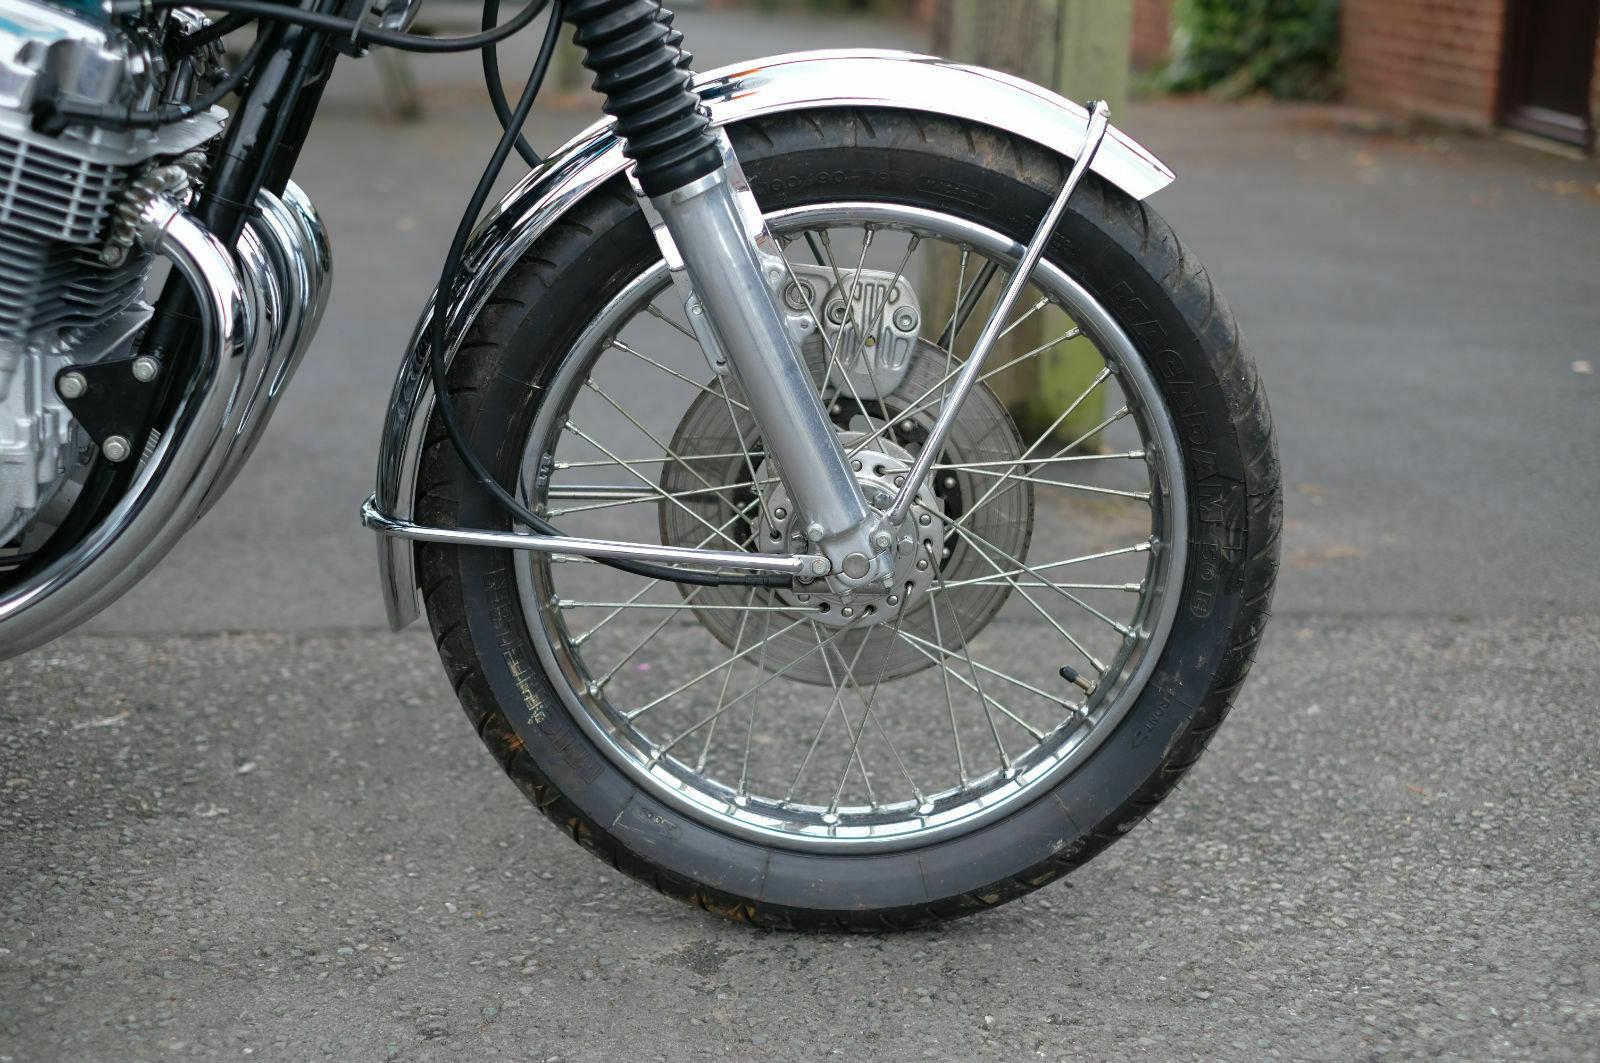 Honda CB750 CB 750 Sandcast 1969 ground up restoration *STUN SOLD (picture 5 of 6)